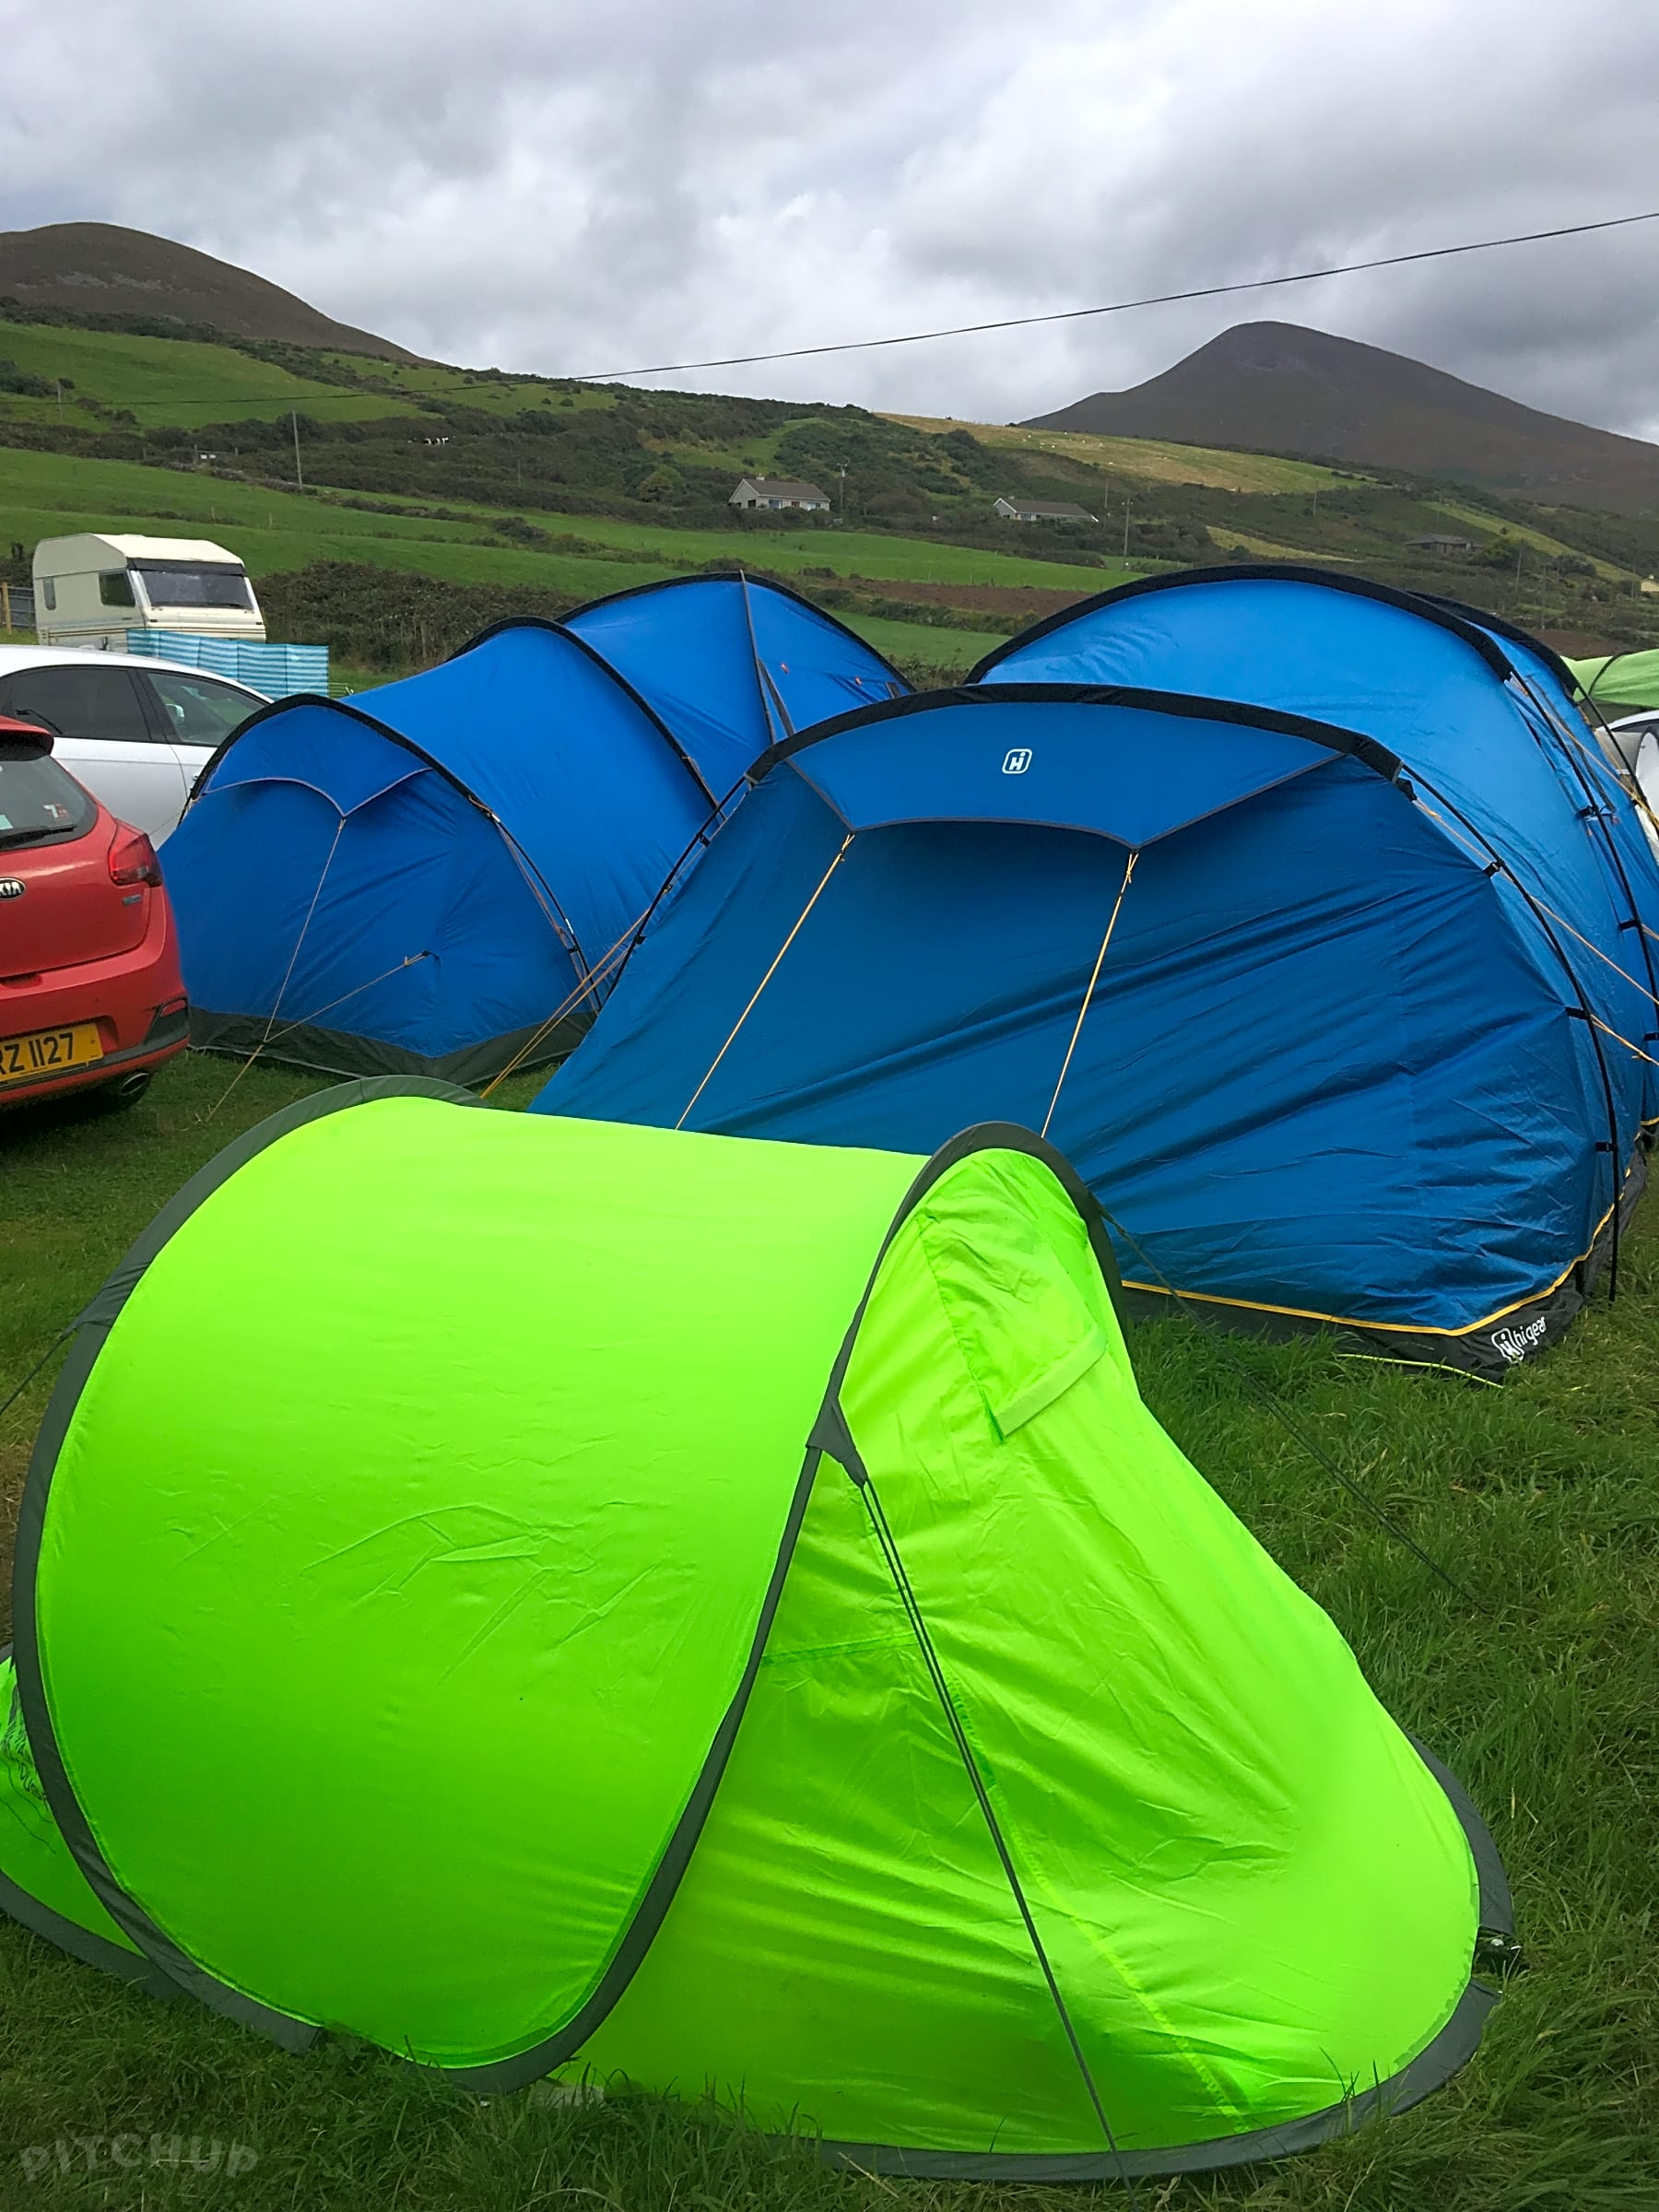 Book Motorhome Campsites & Campervan Sites in Kells, Co